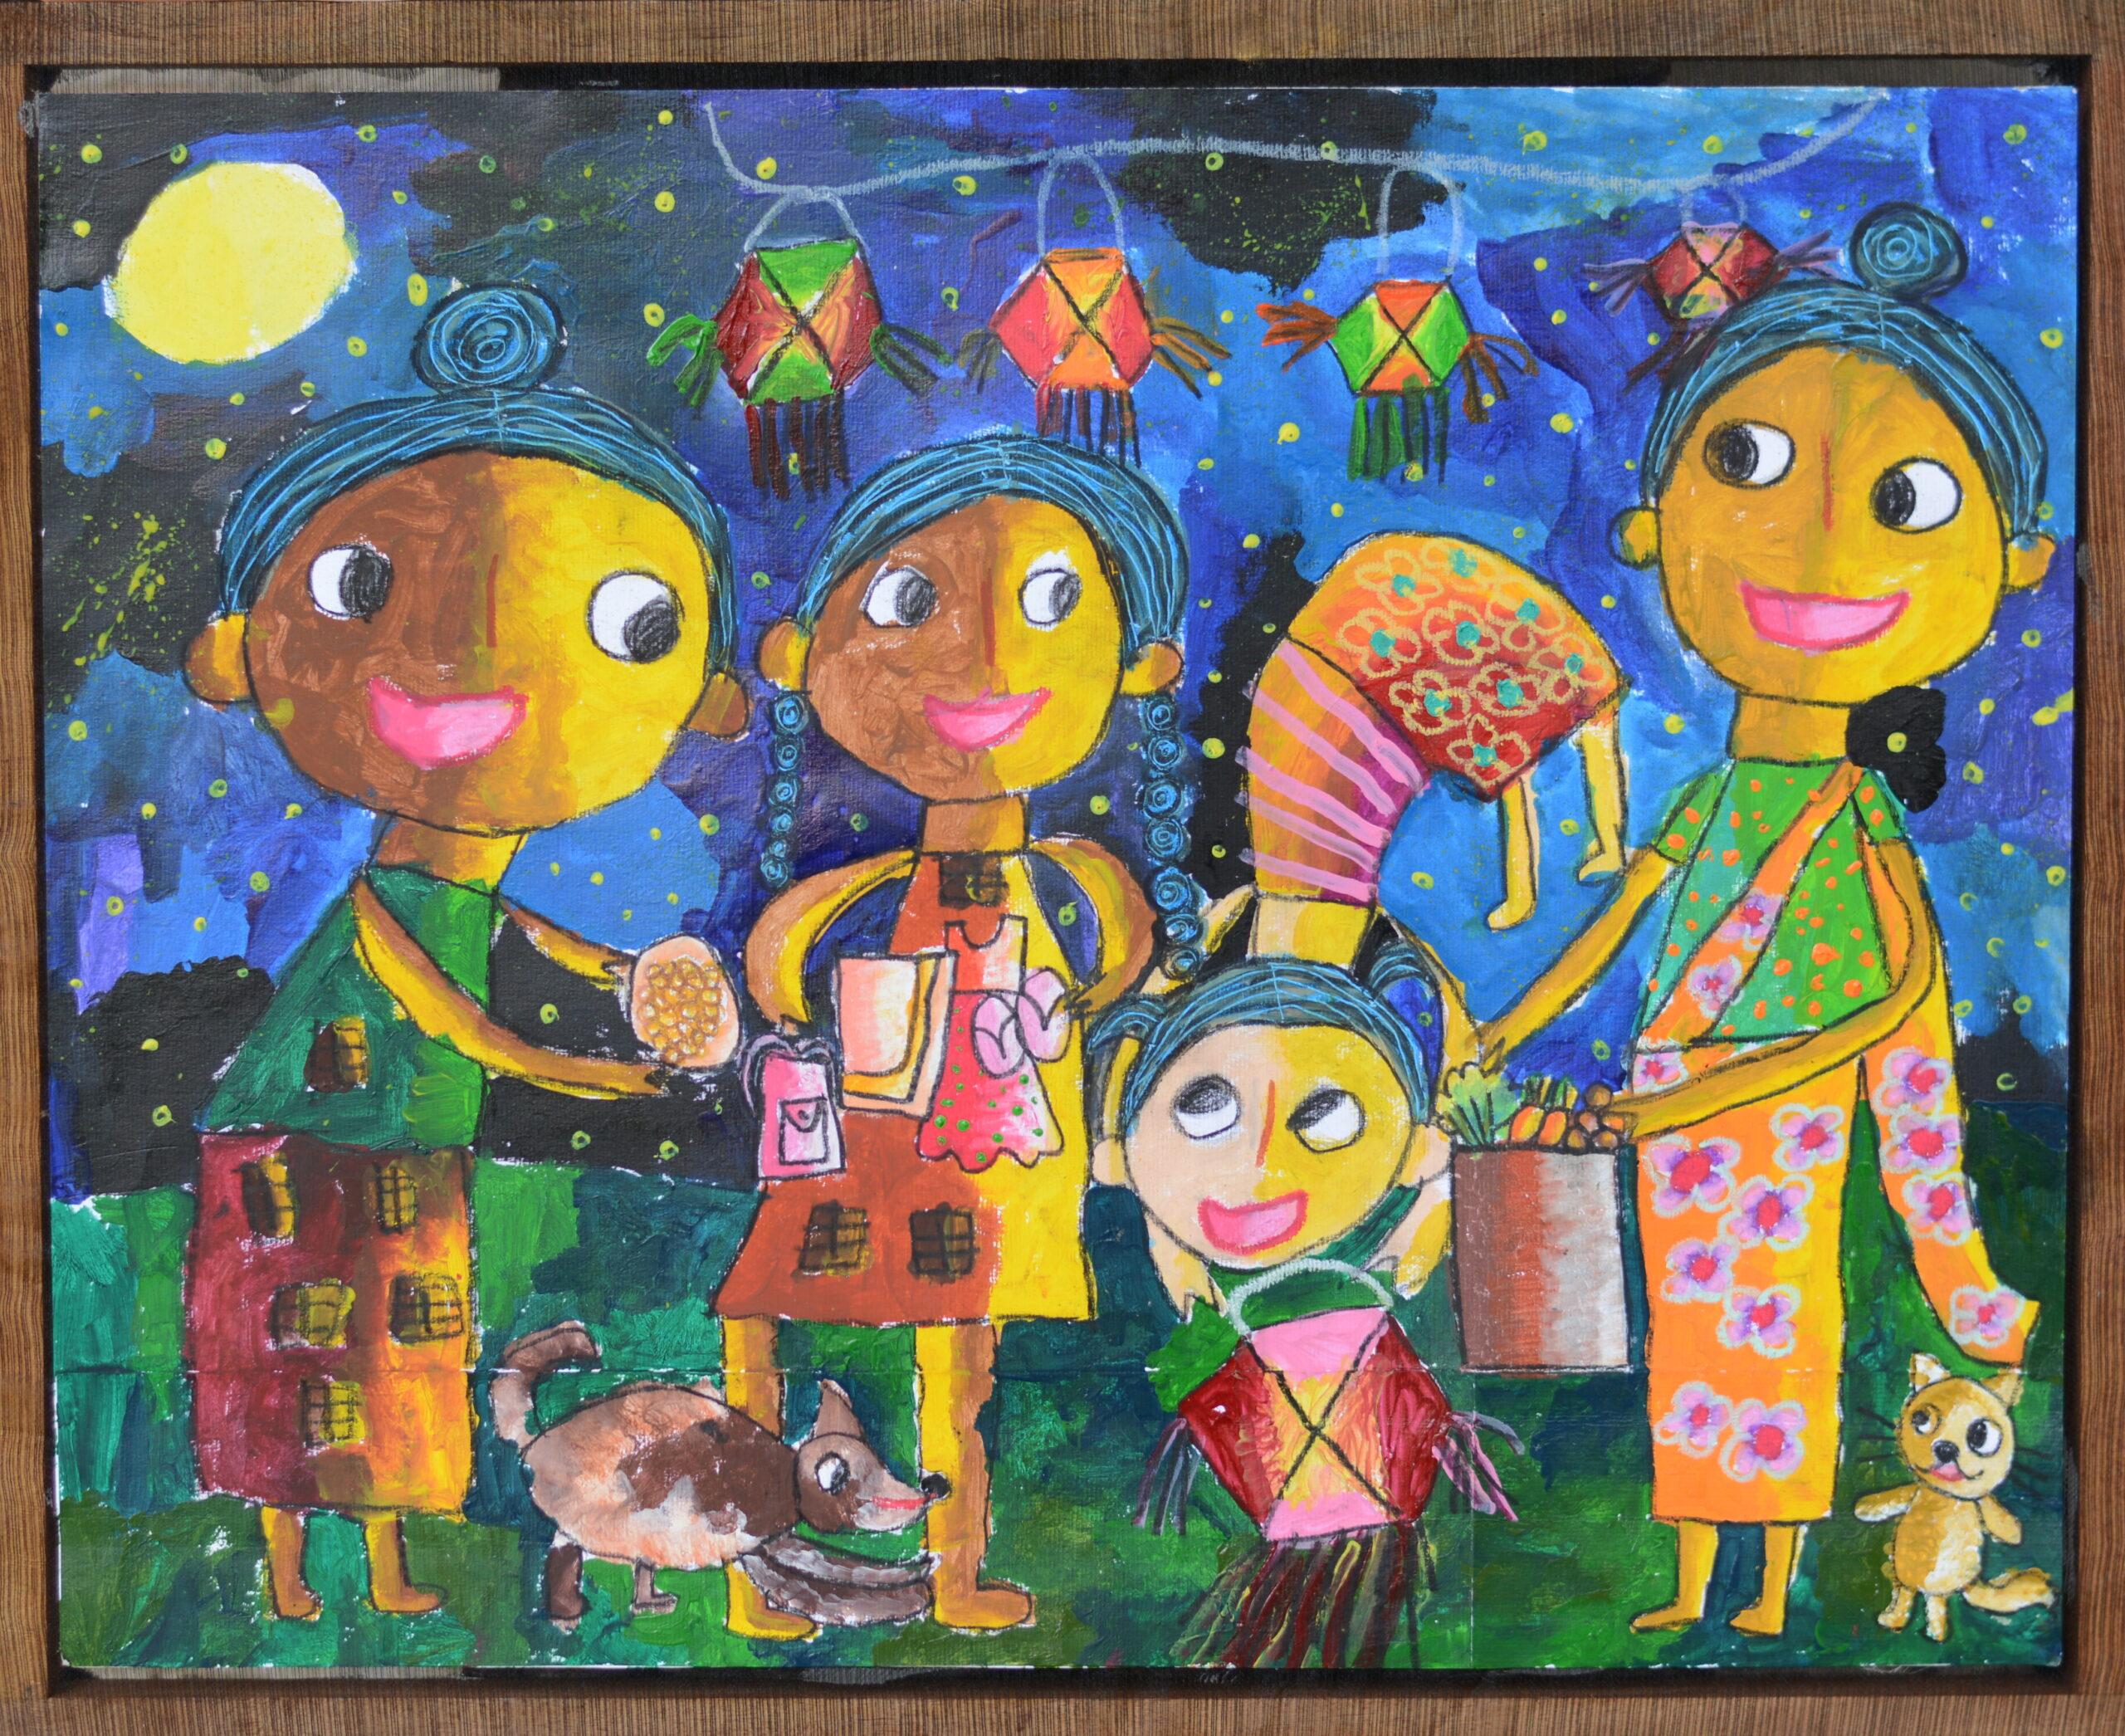 A free meal donation on a Wesak Full Moon poya day_D.M.Dasithi Hesara Dissanayake